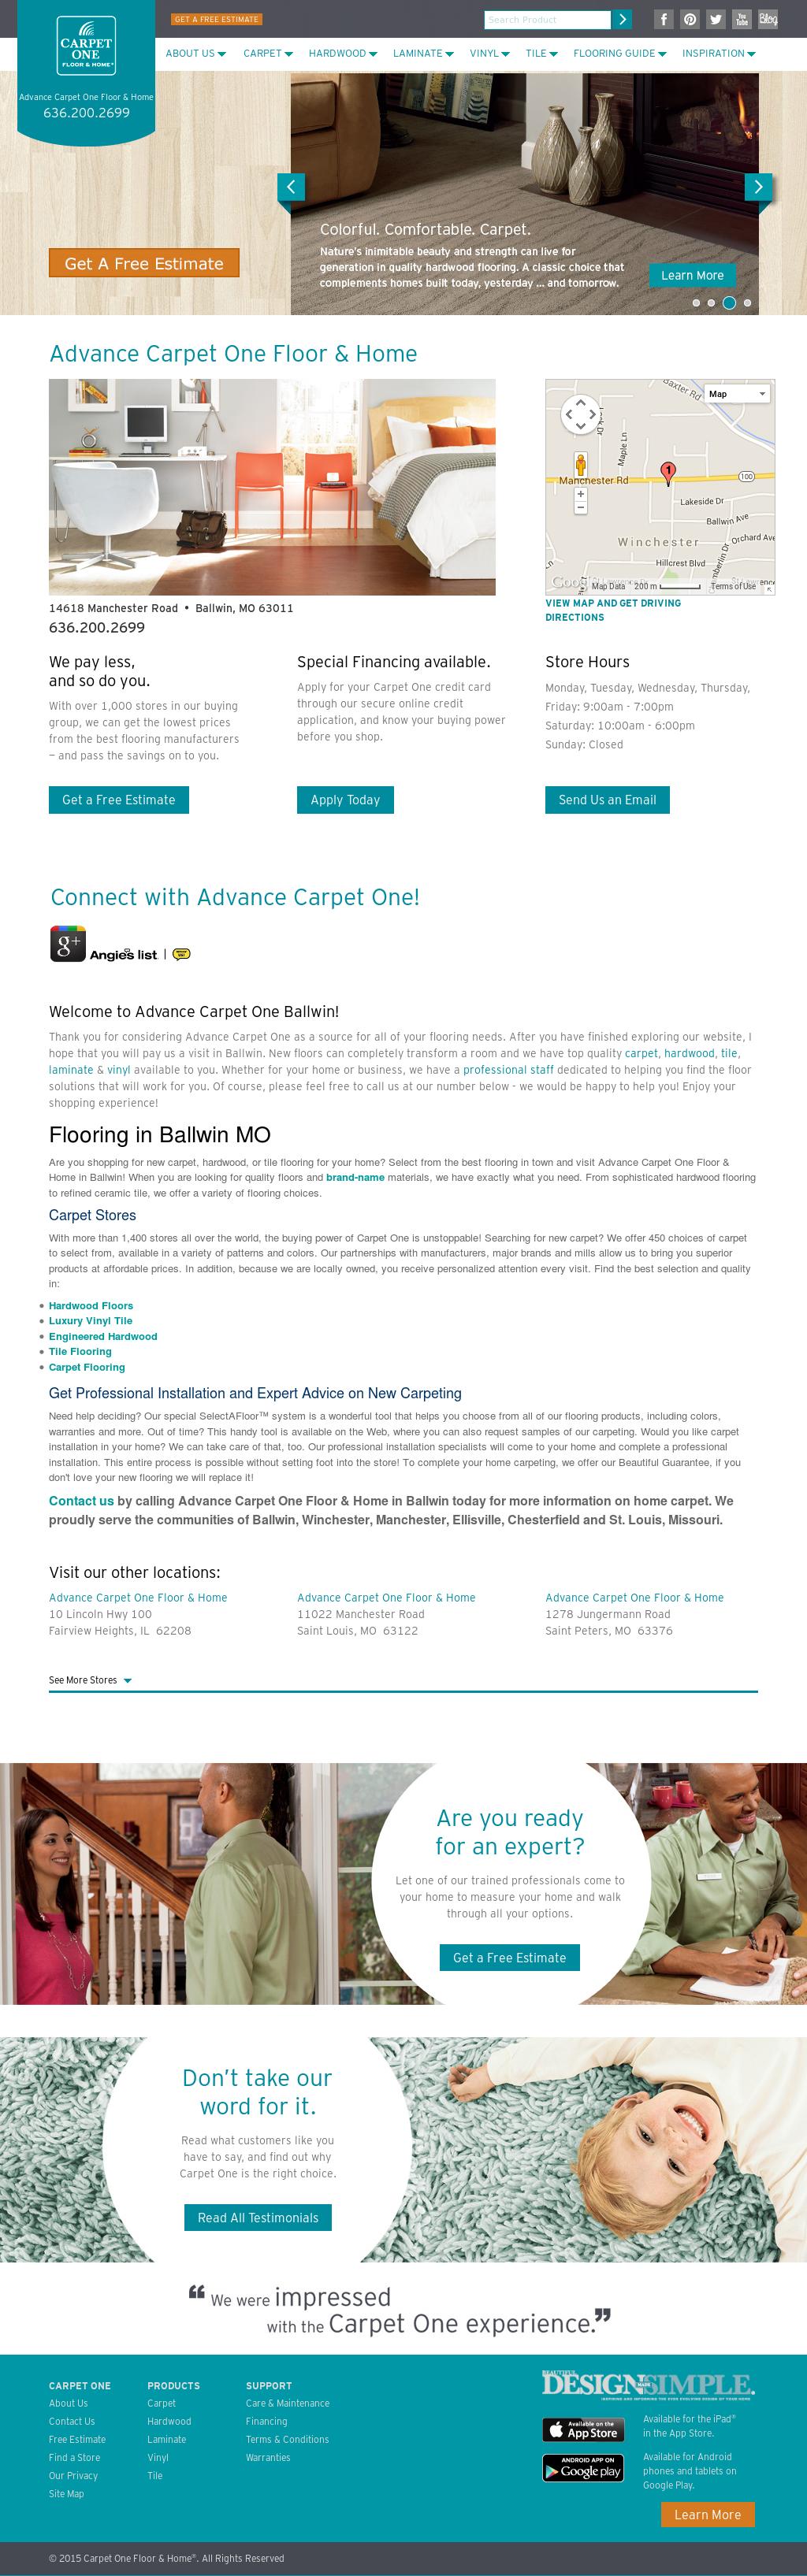 Advancecarpetoneballwin Competitors, Revenue and Employees - Owler Company Profile